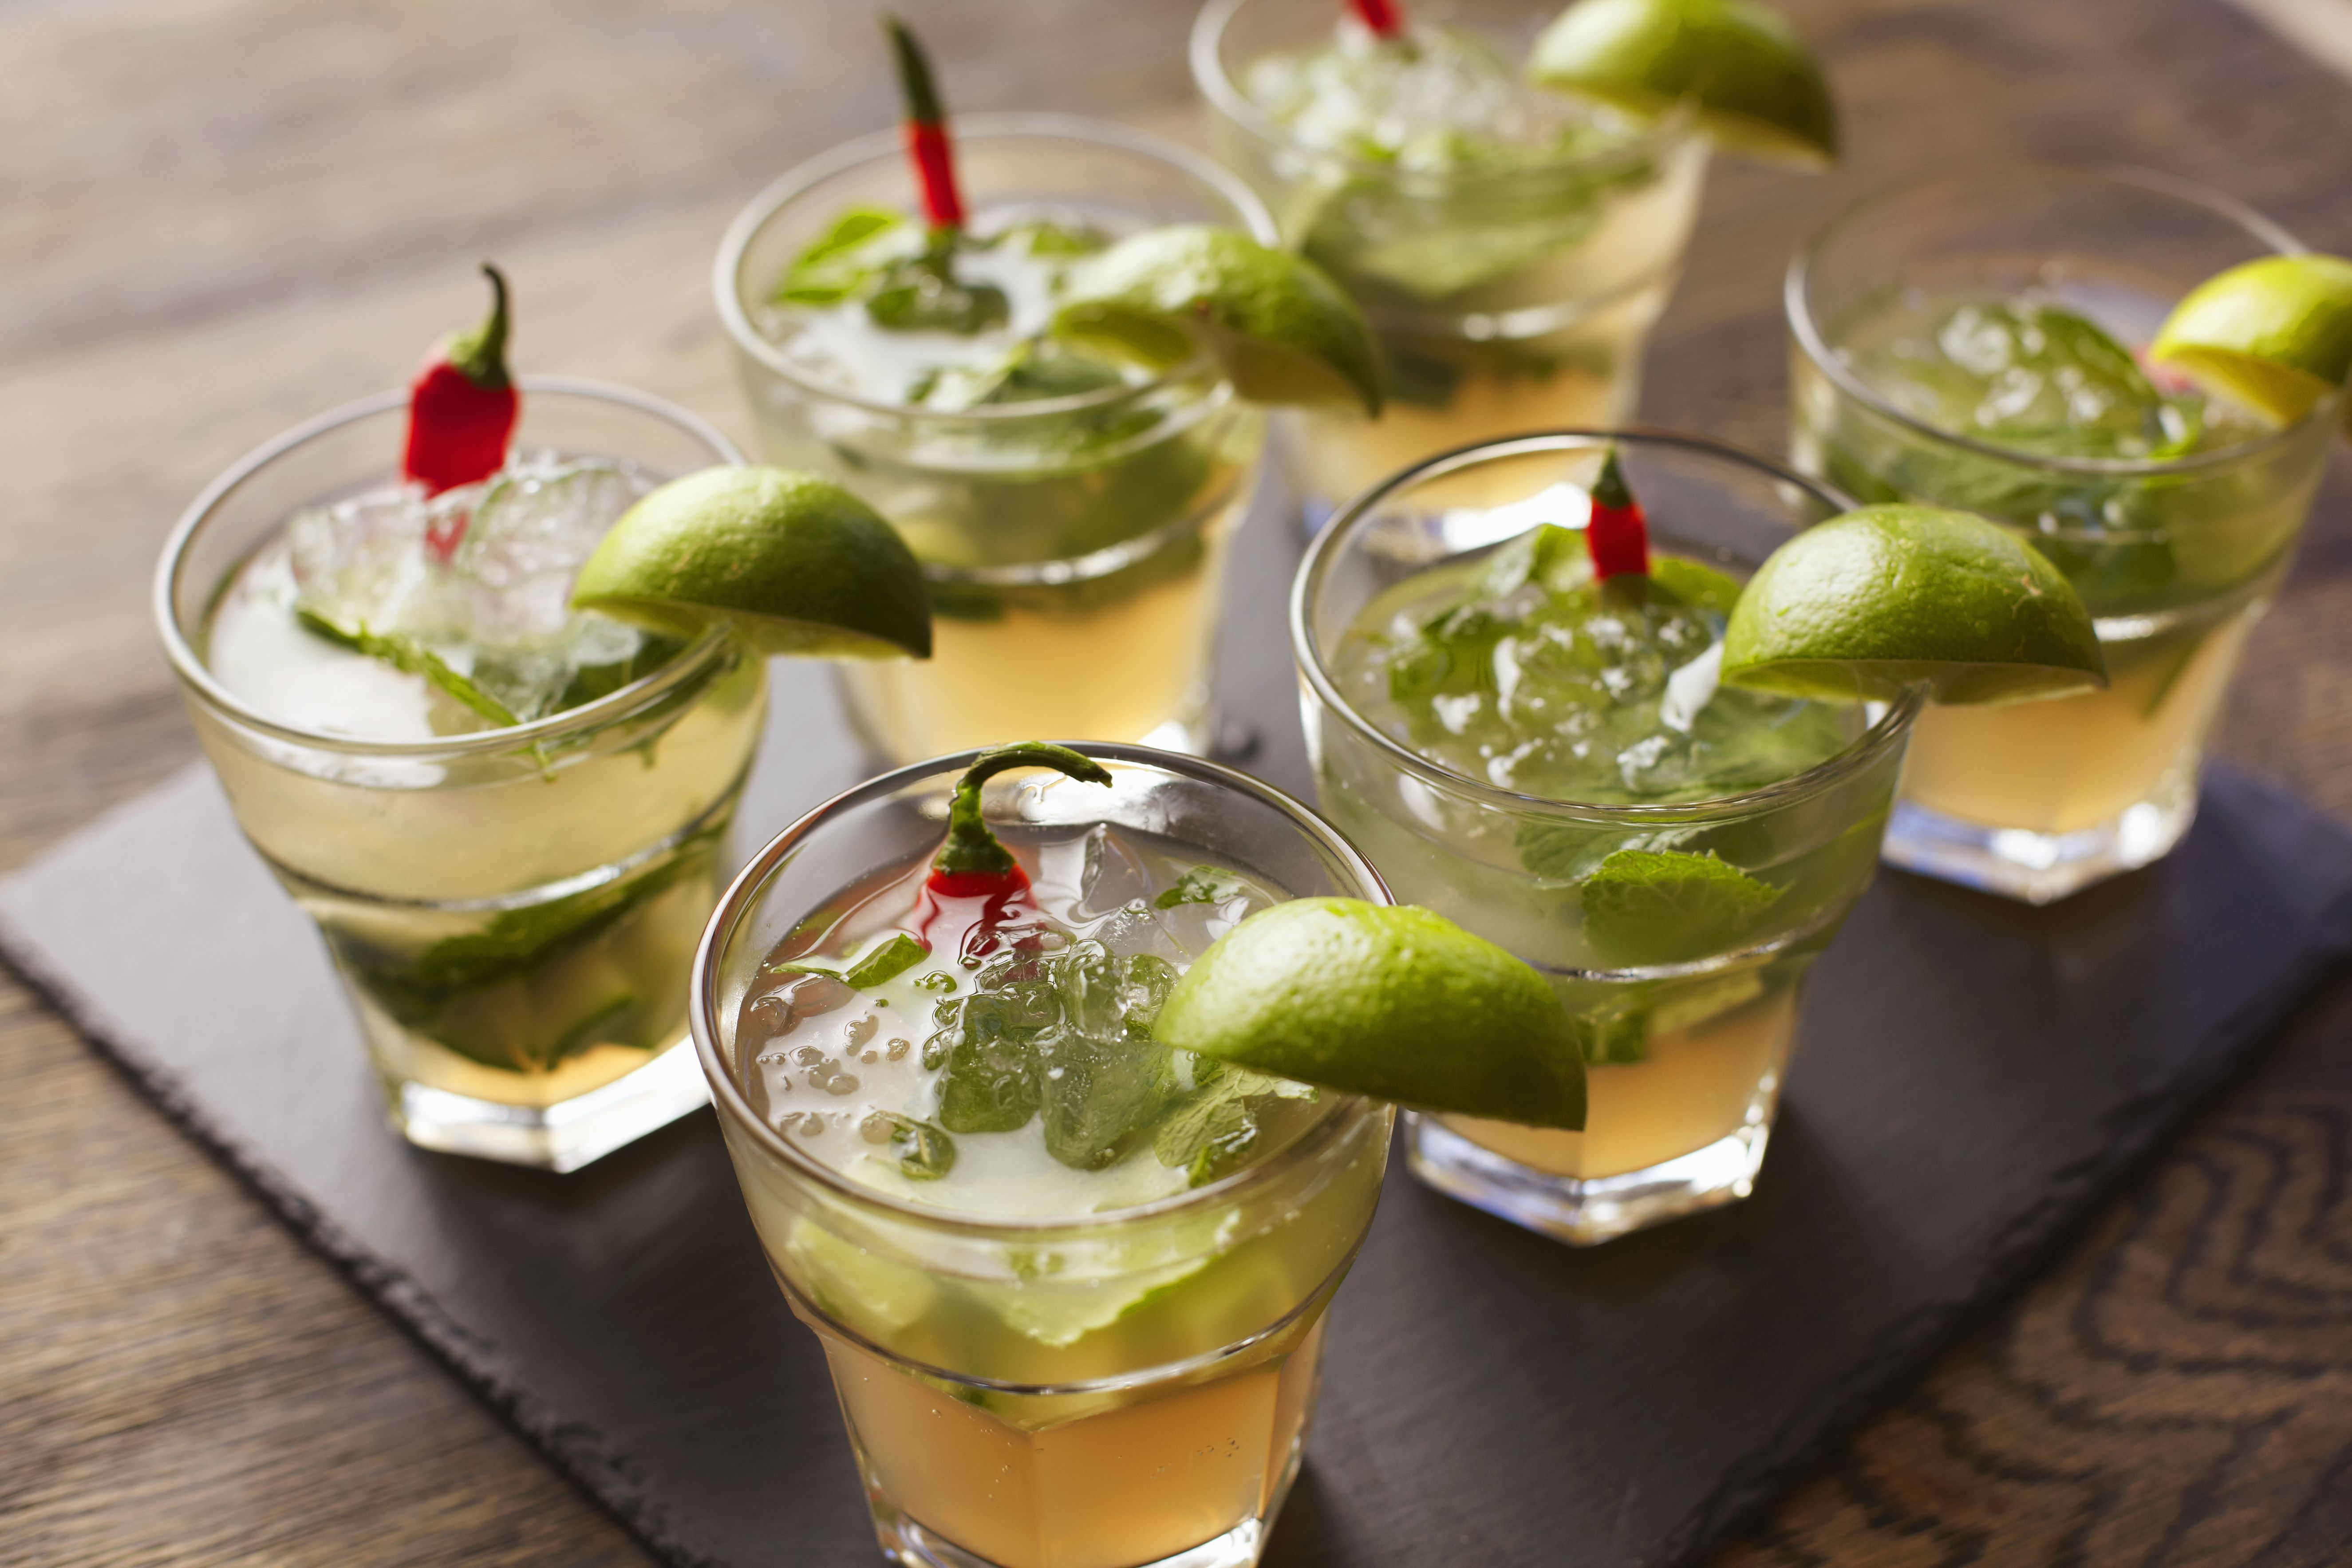 Chilli vodka cocktail garnished with lime wedges